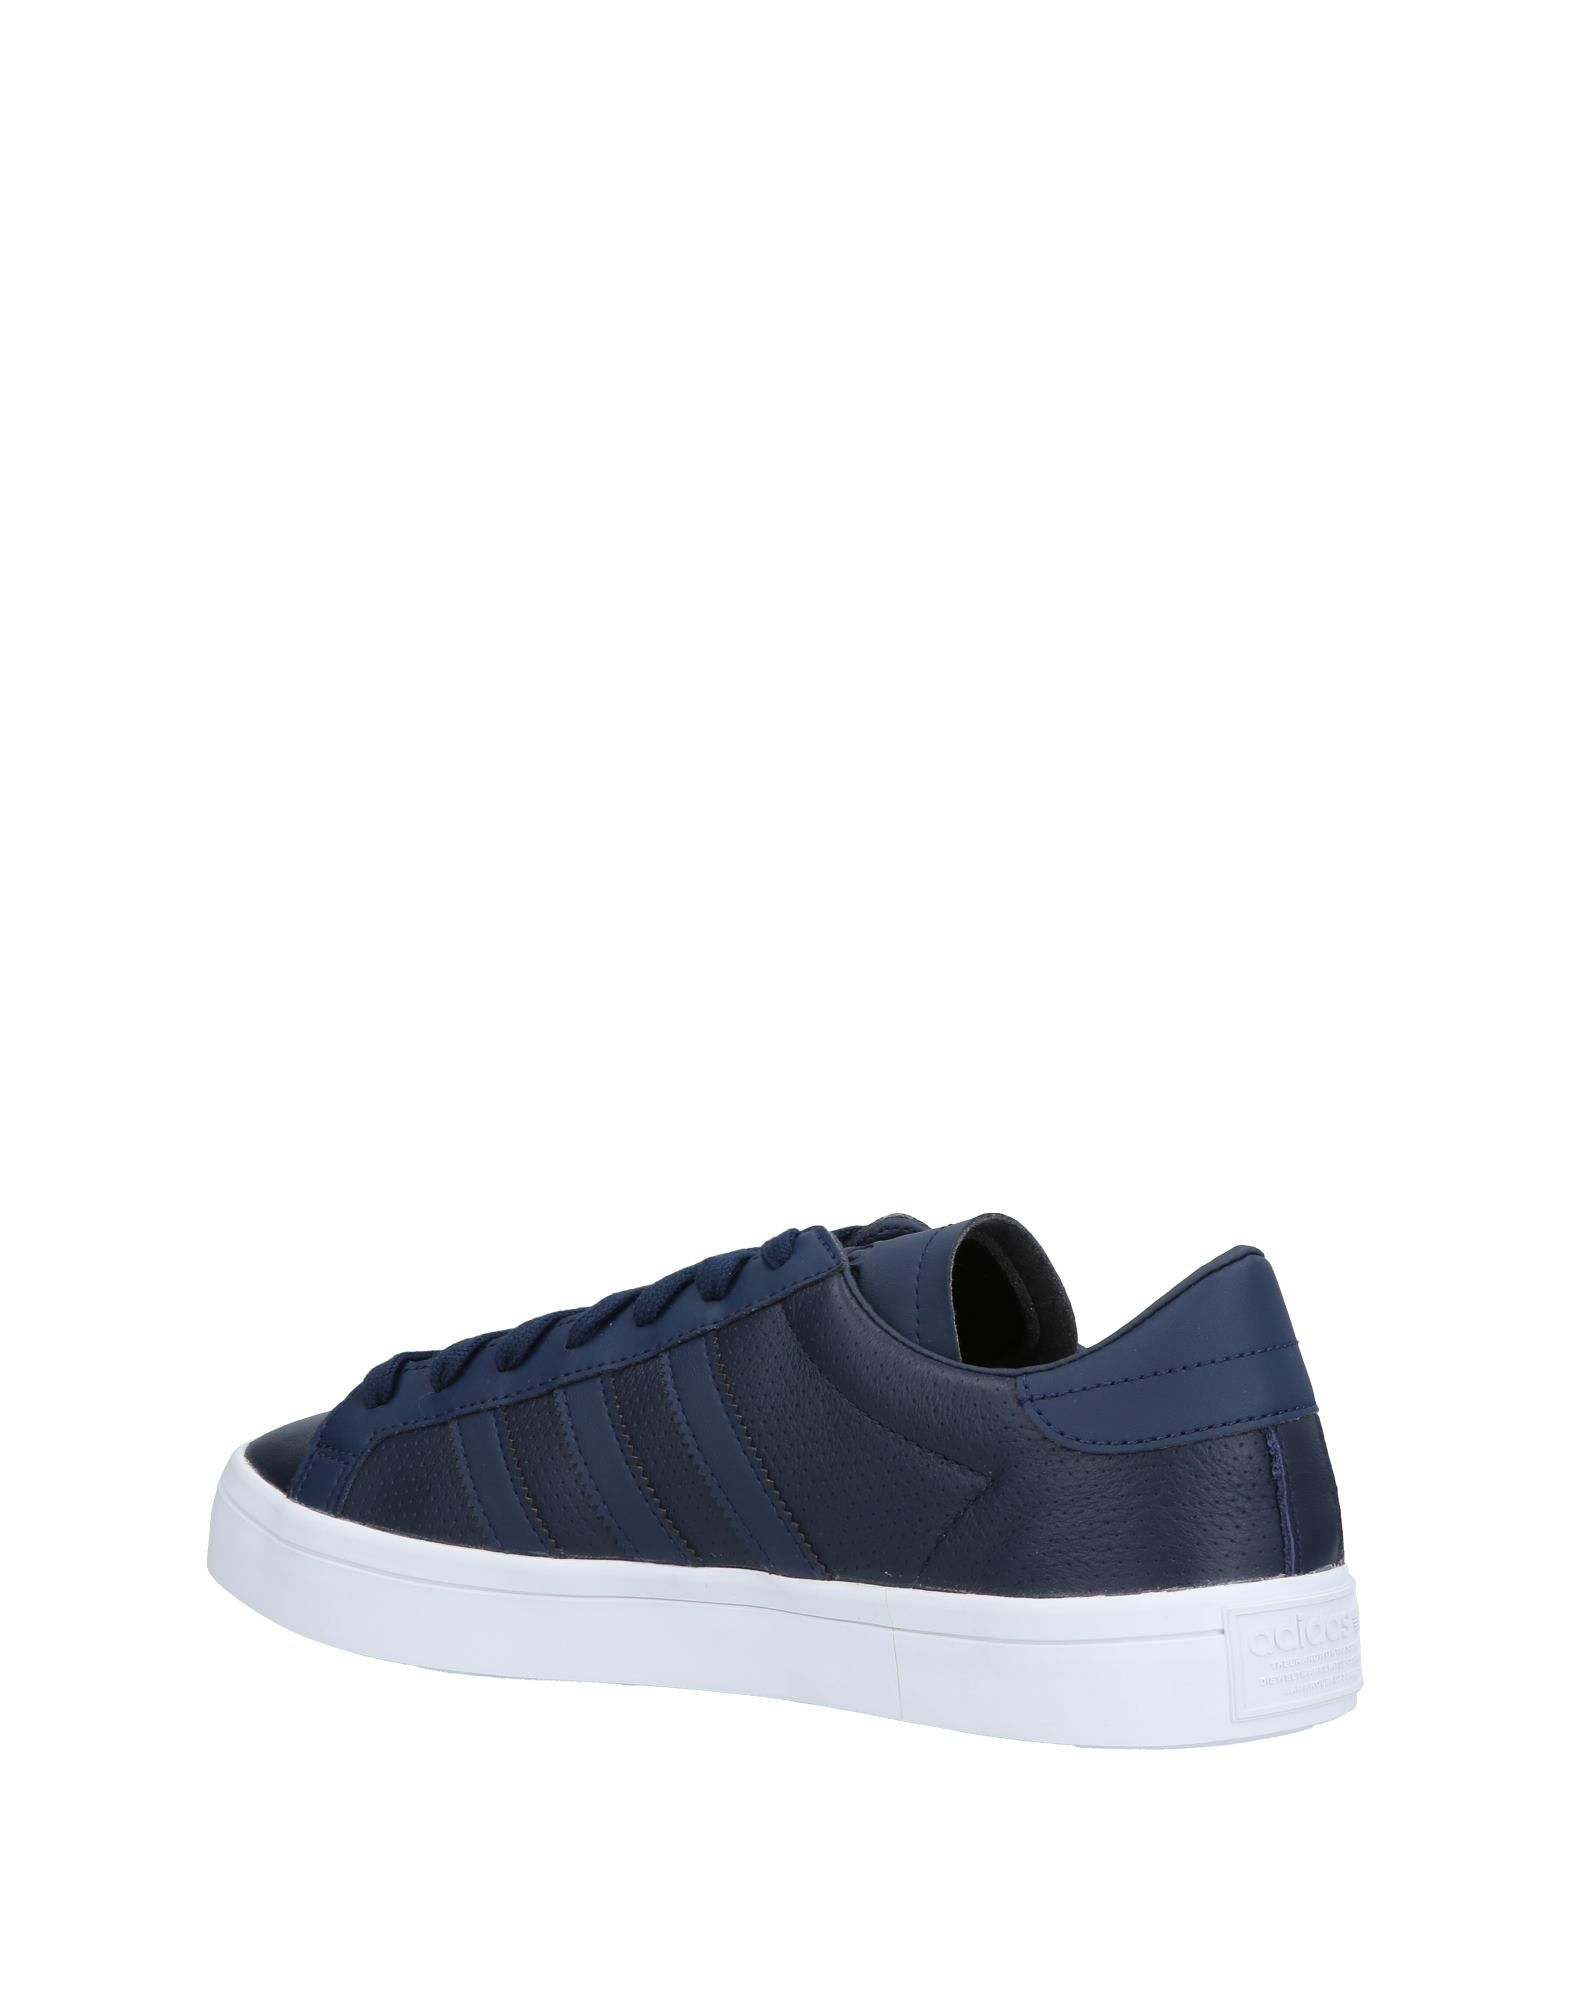 Rabatt Originals echte Schuhe Adidas Originals Rabatt Sneakers Herren  11480784EU f112fa